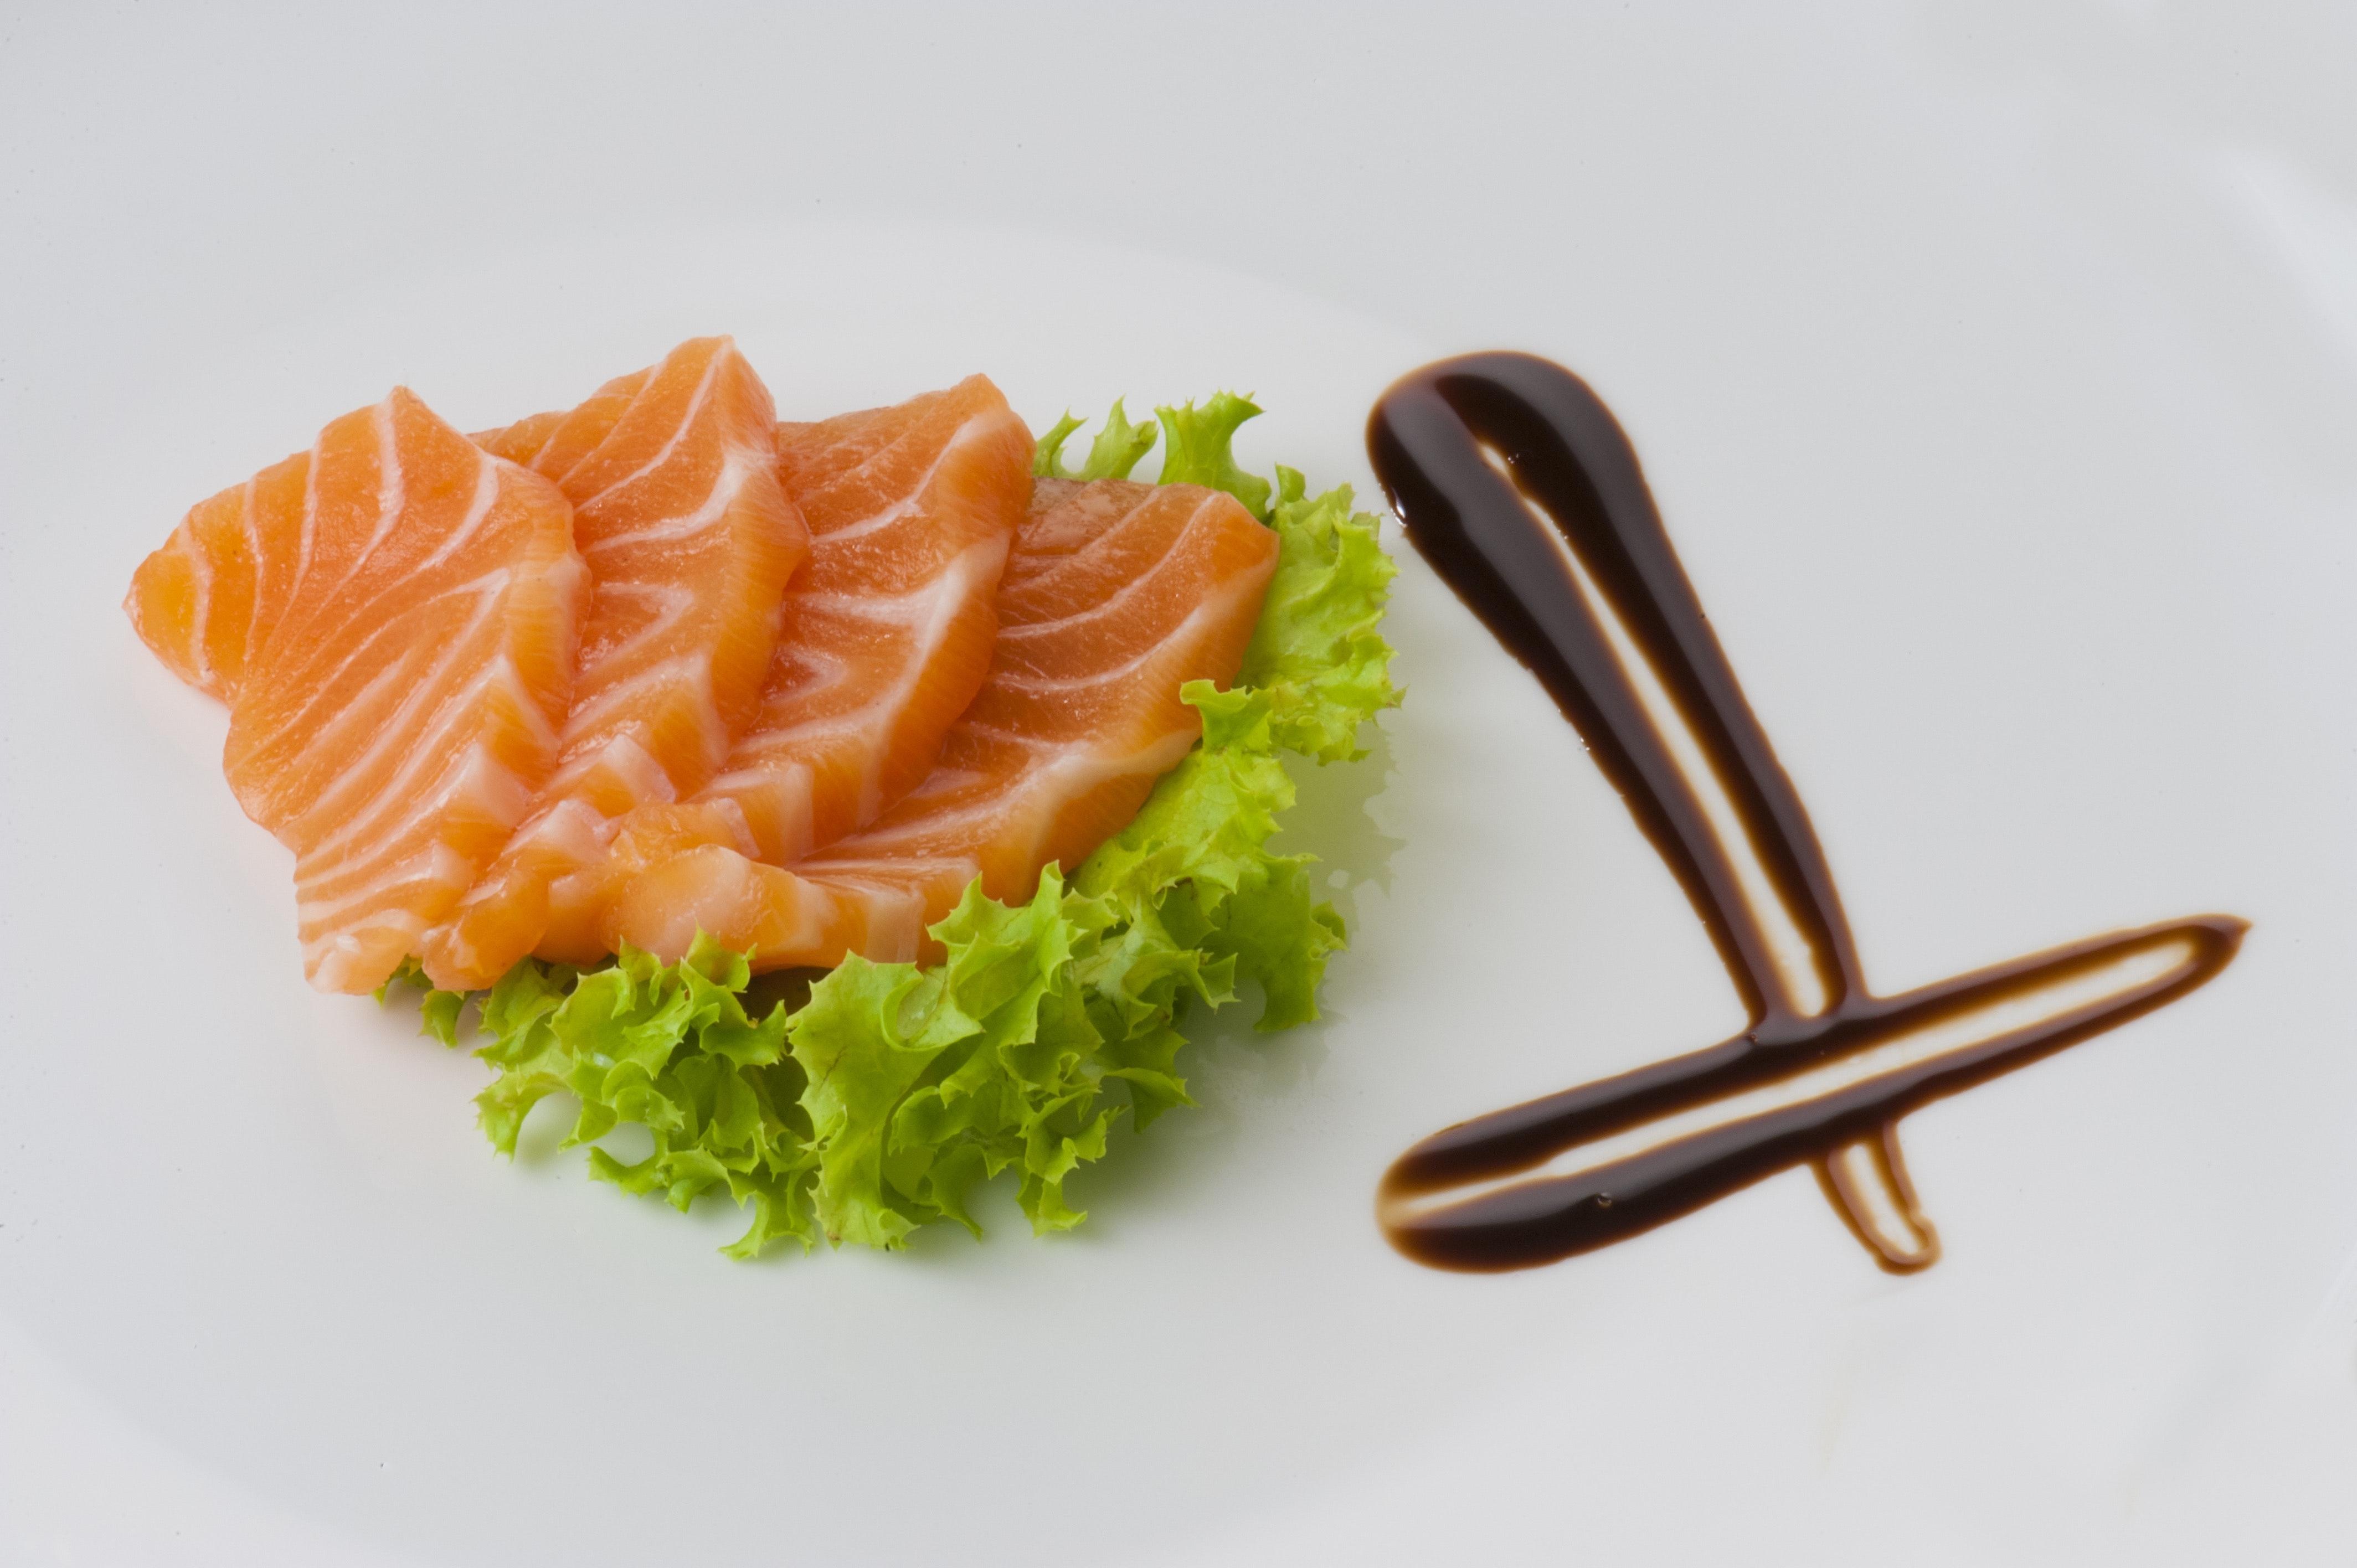 Pesce crudo: come consumarlo senza correre rischi